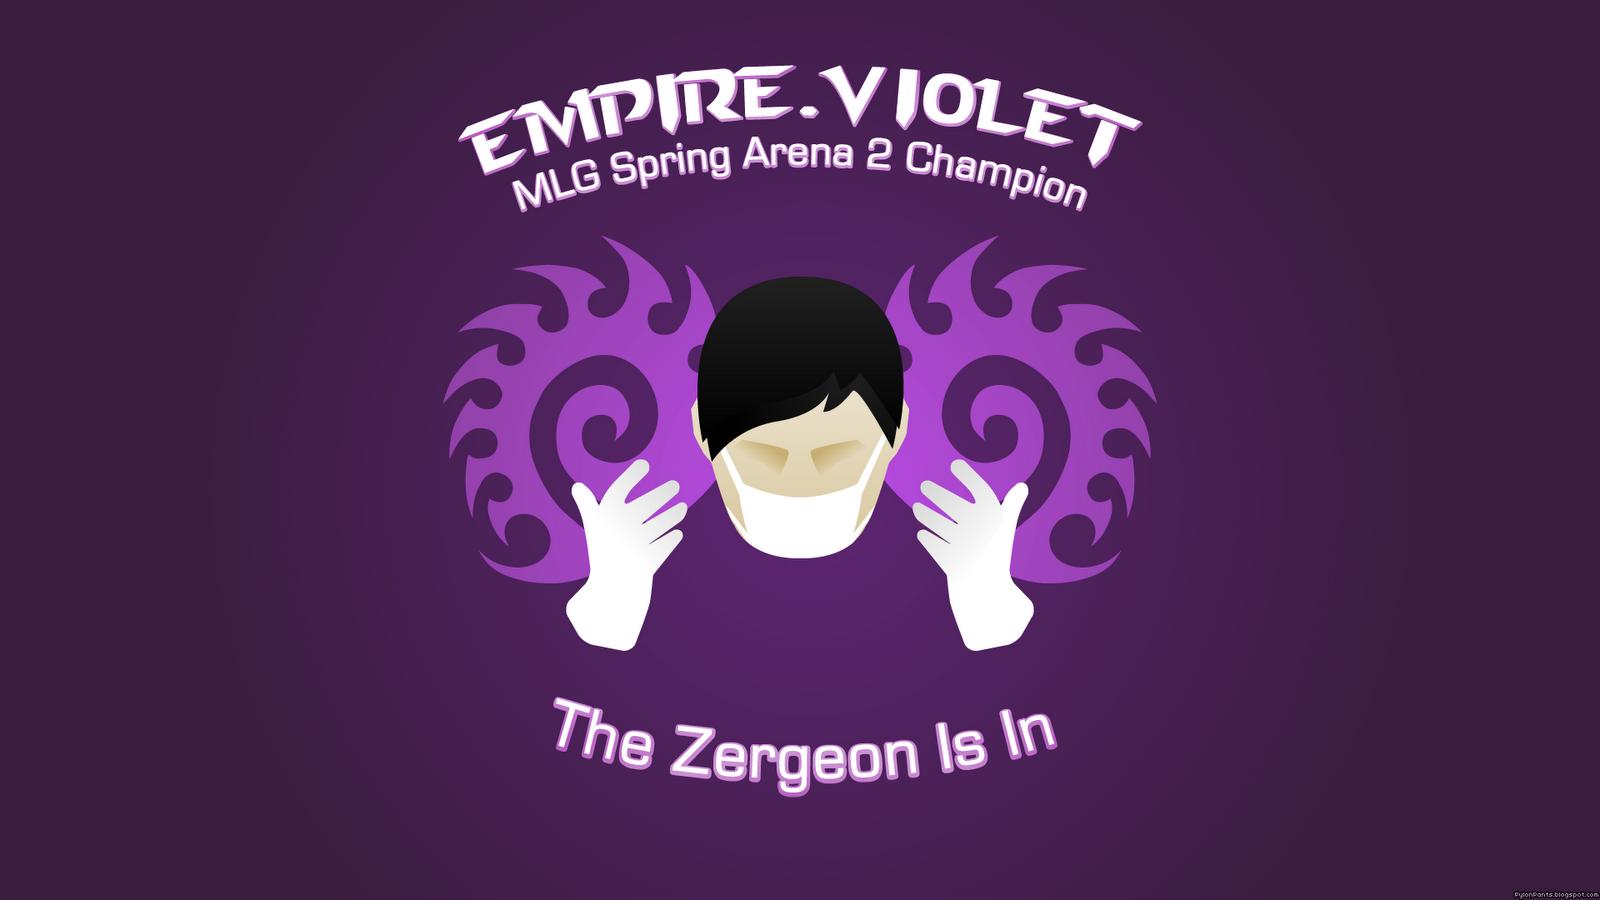 Empire Violet Wins MLG Spring Arena 2 Celebratory Wallpaper